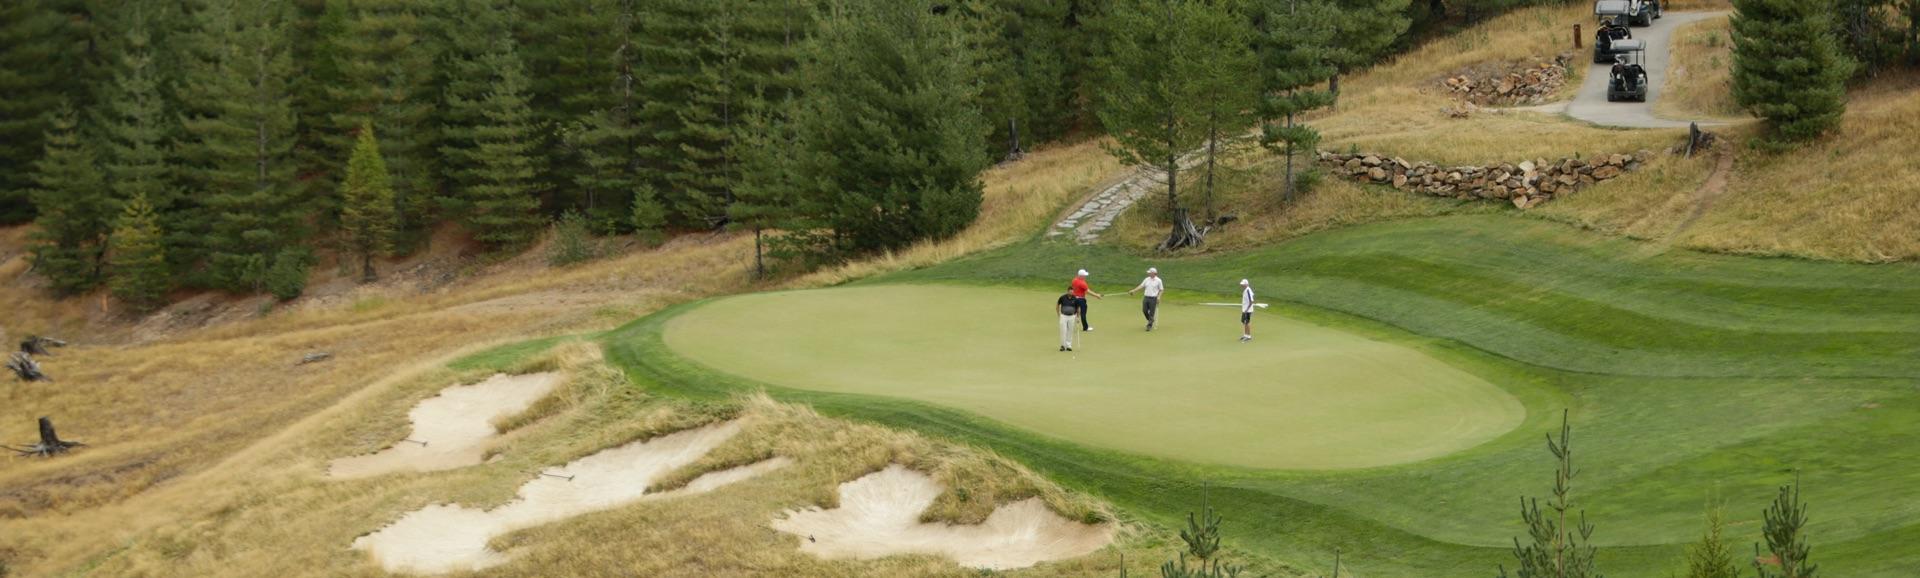 Golf desktop image